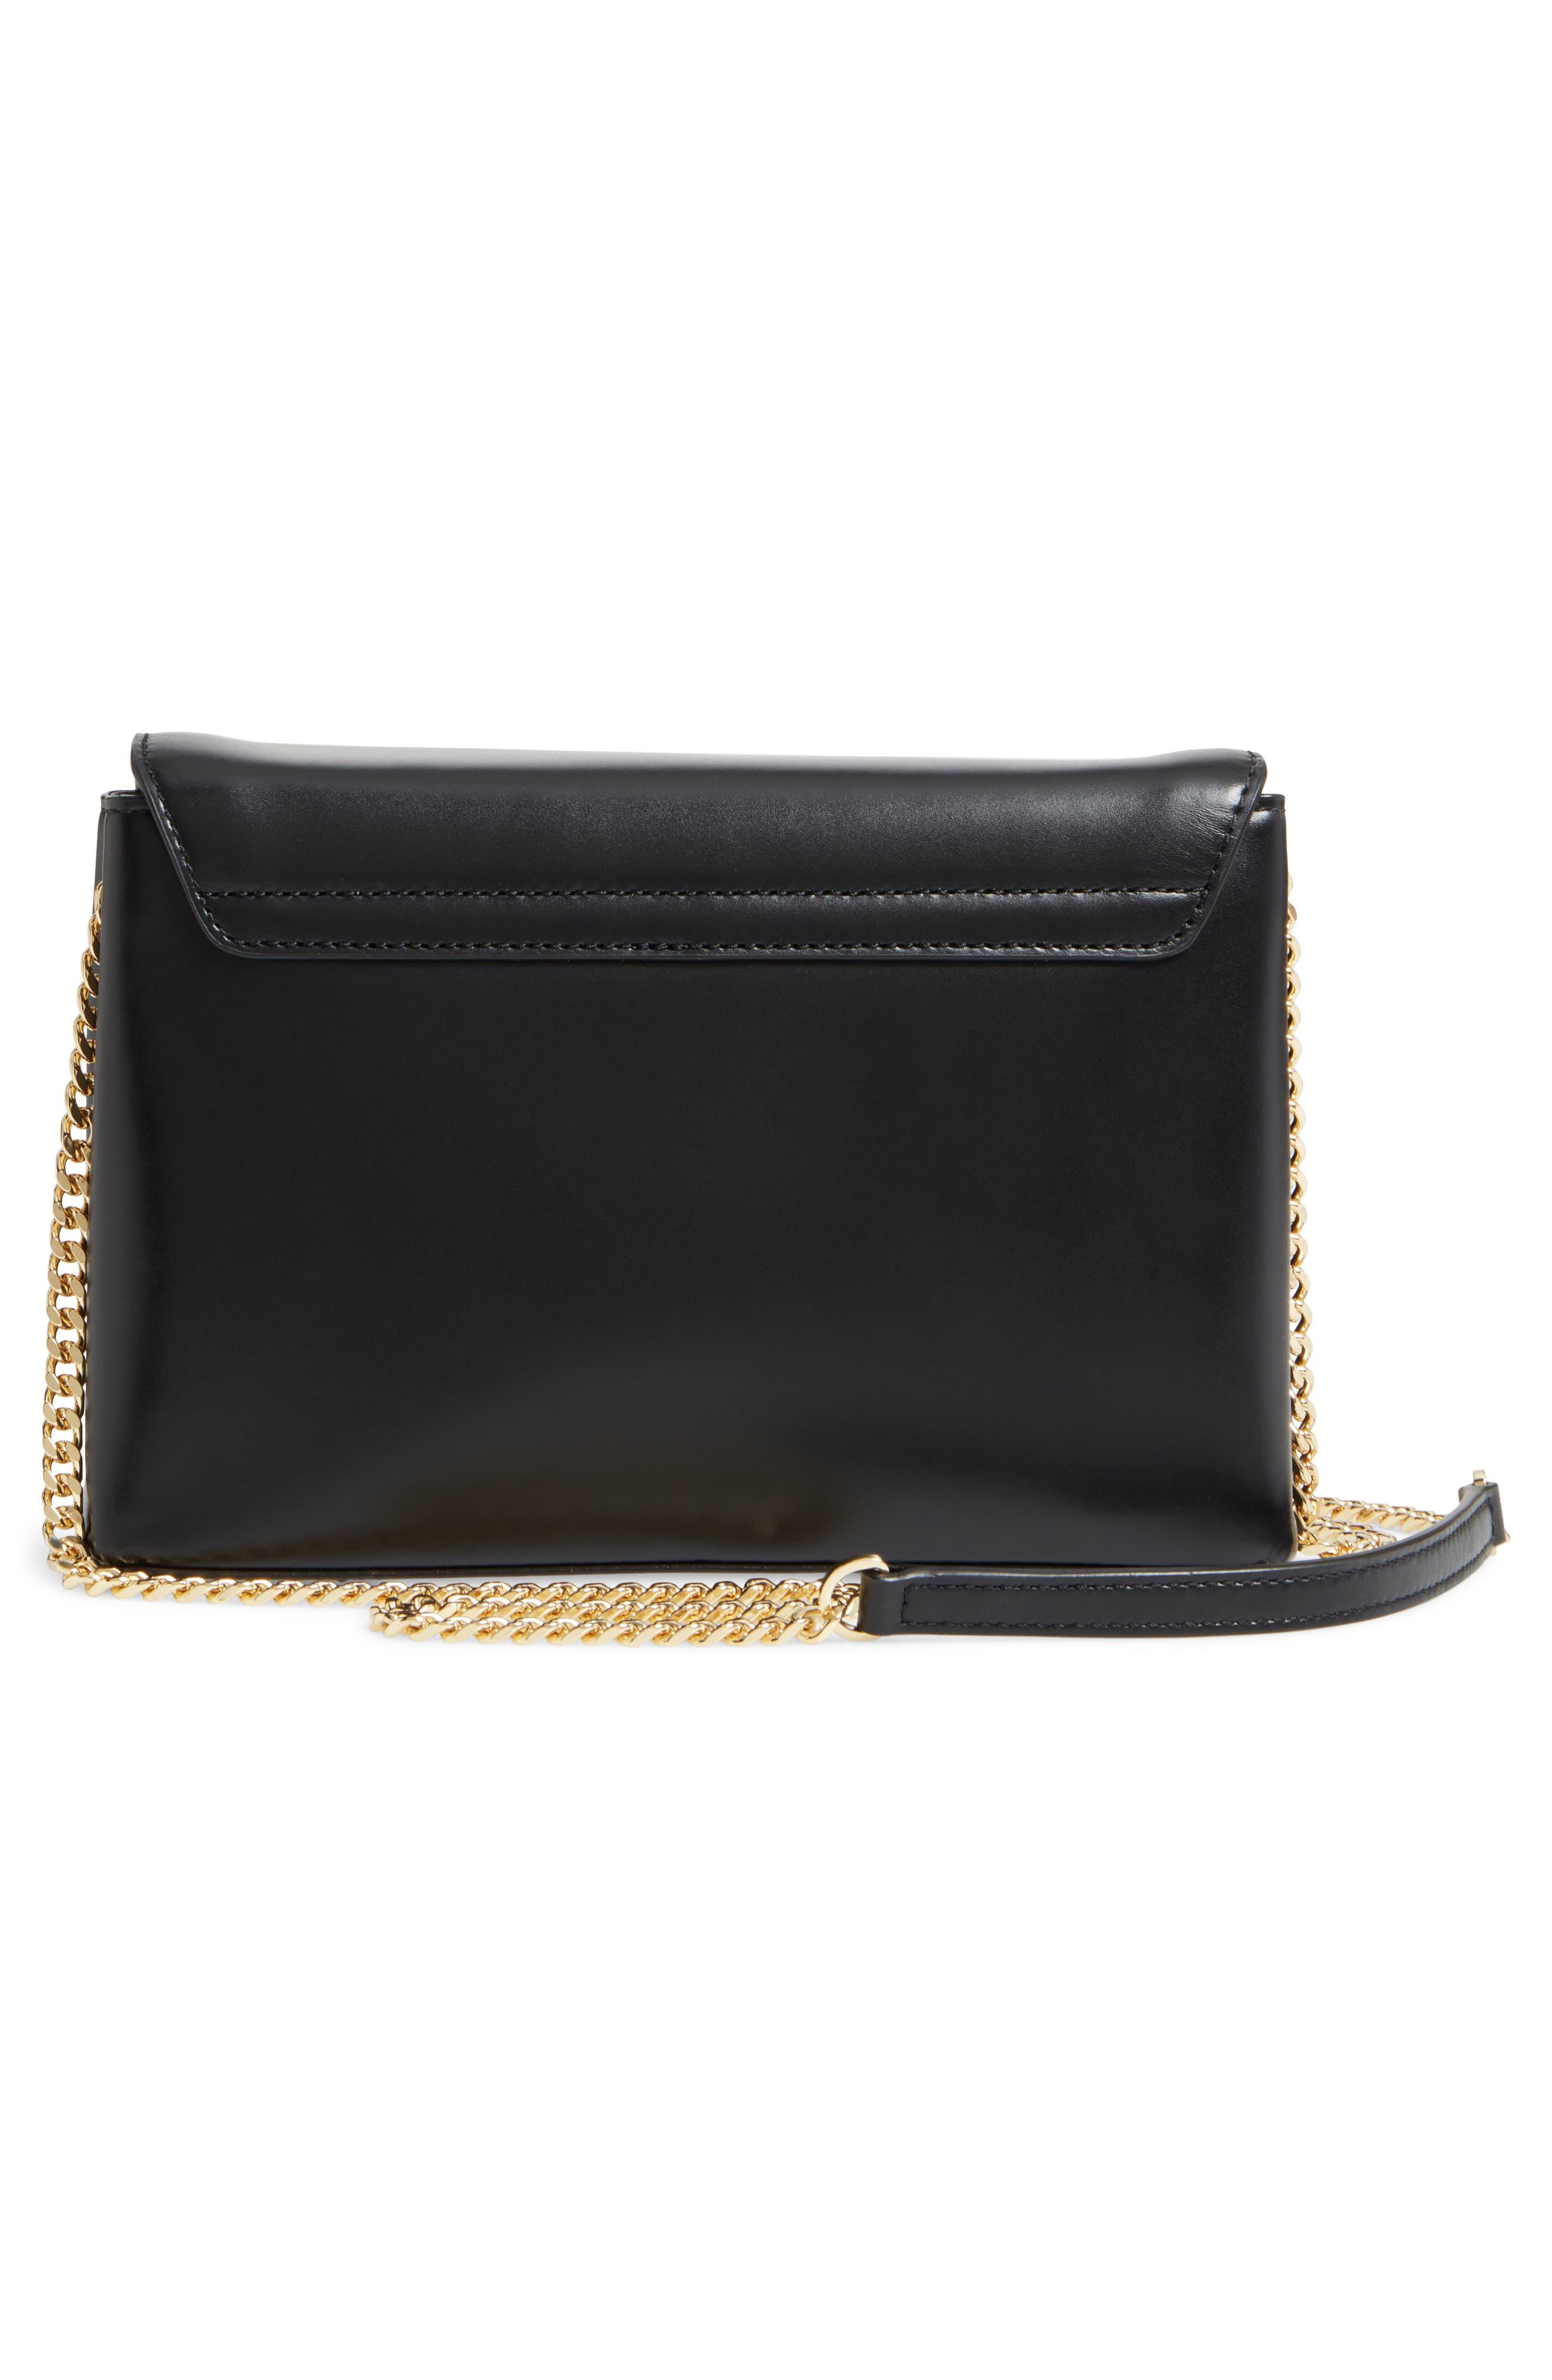 Saraa Leather Crossbody Bag,                             Alternate thumbnail 3, color,                             001